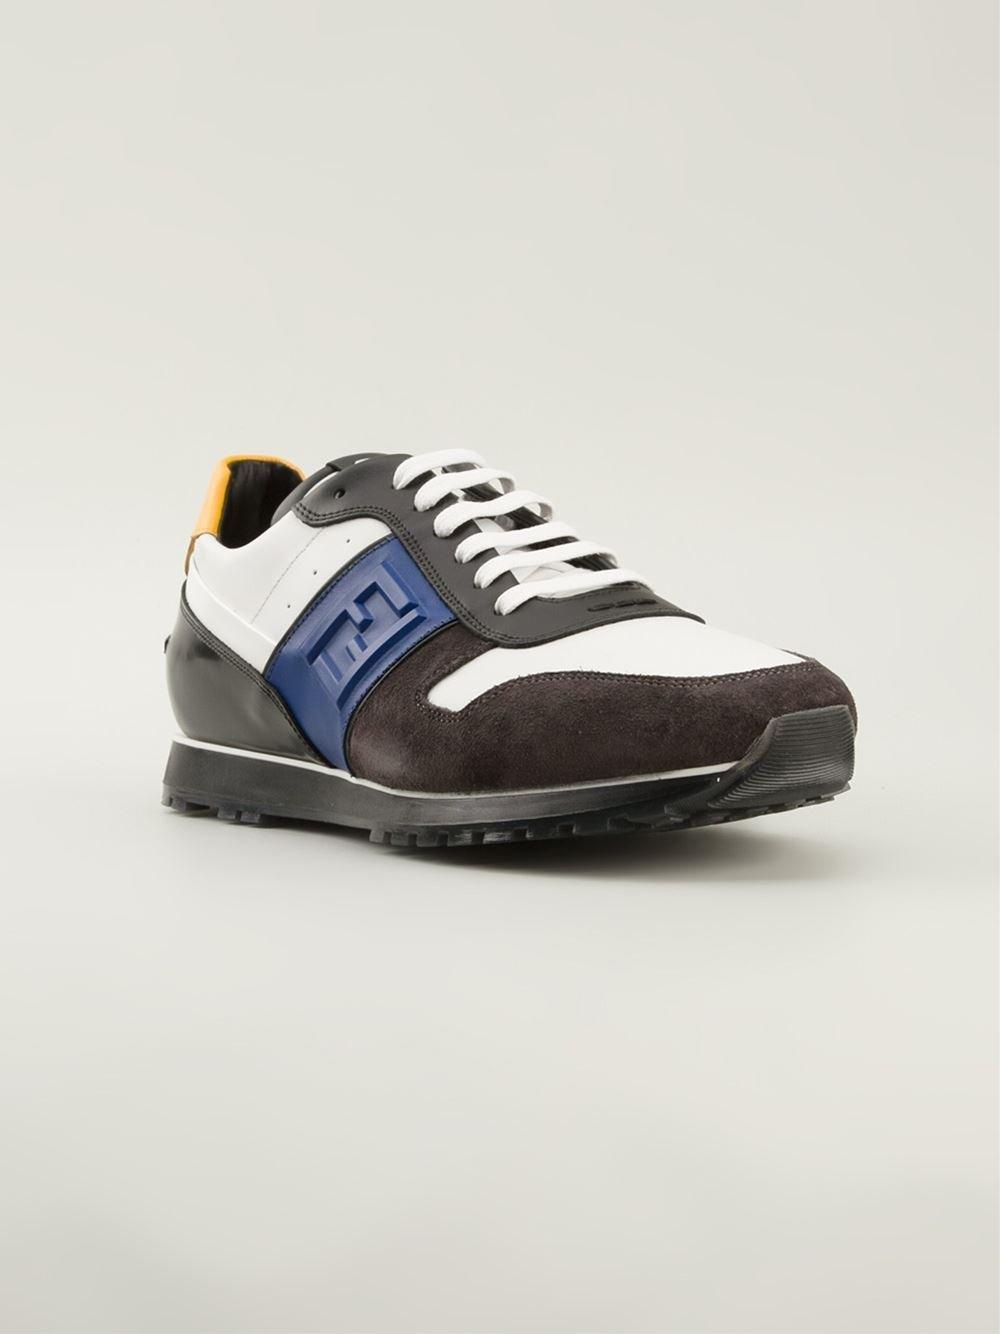 Fendi Low Sneakers In White Brown For Men Lyst